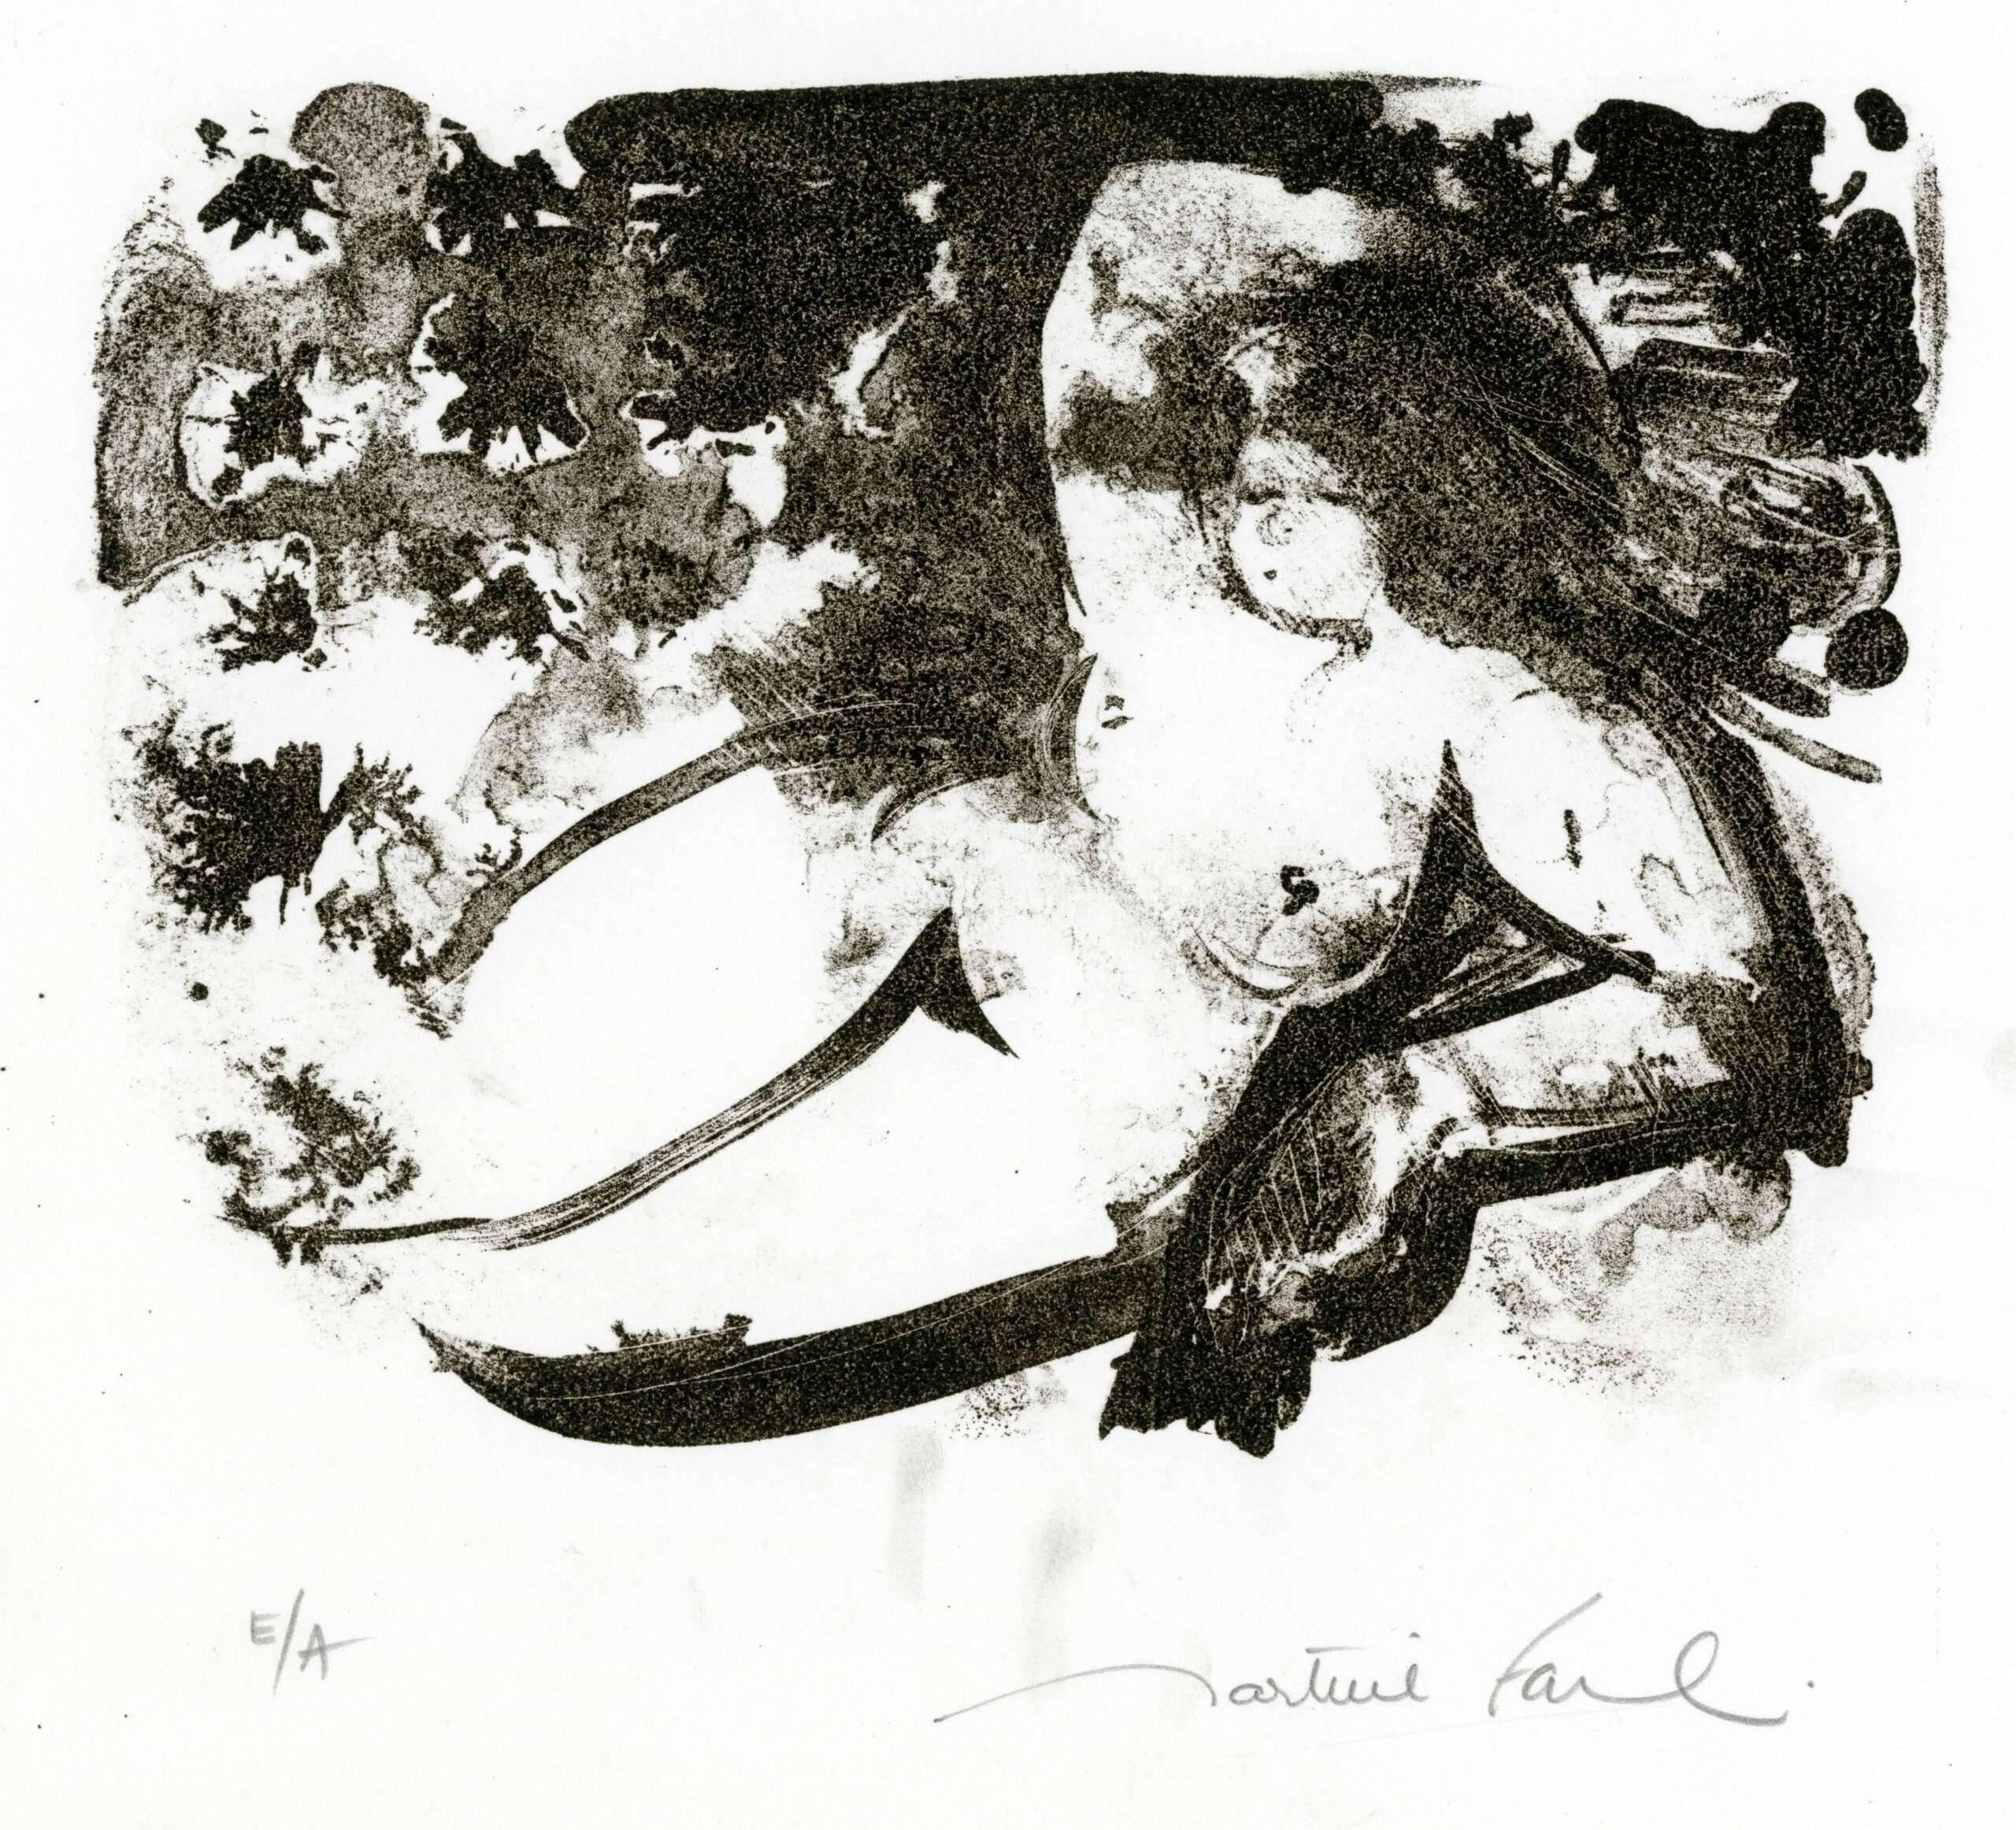 martine-favre-artiste-gravure-litho-femme-nue-lithographie-firmament